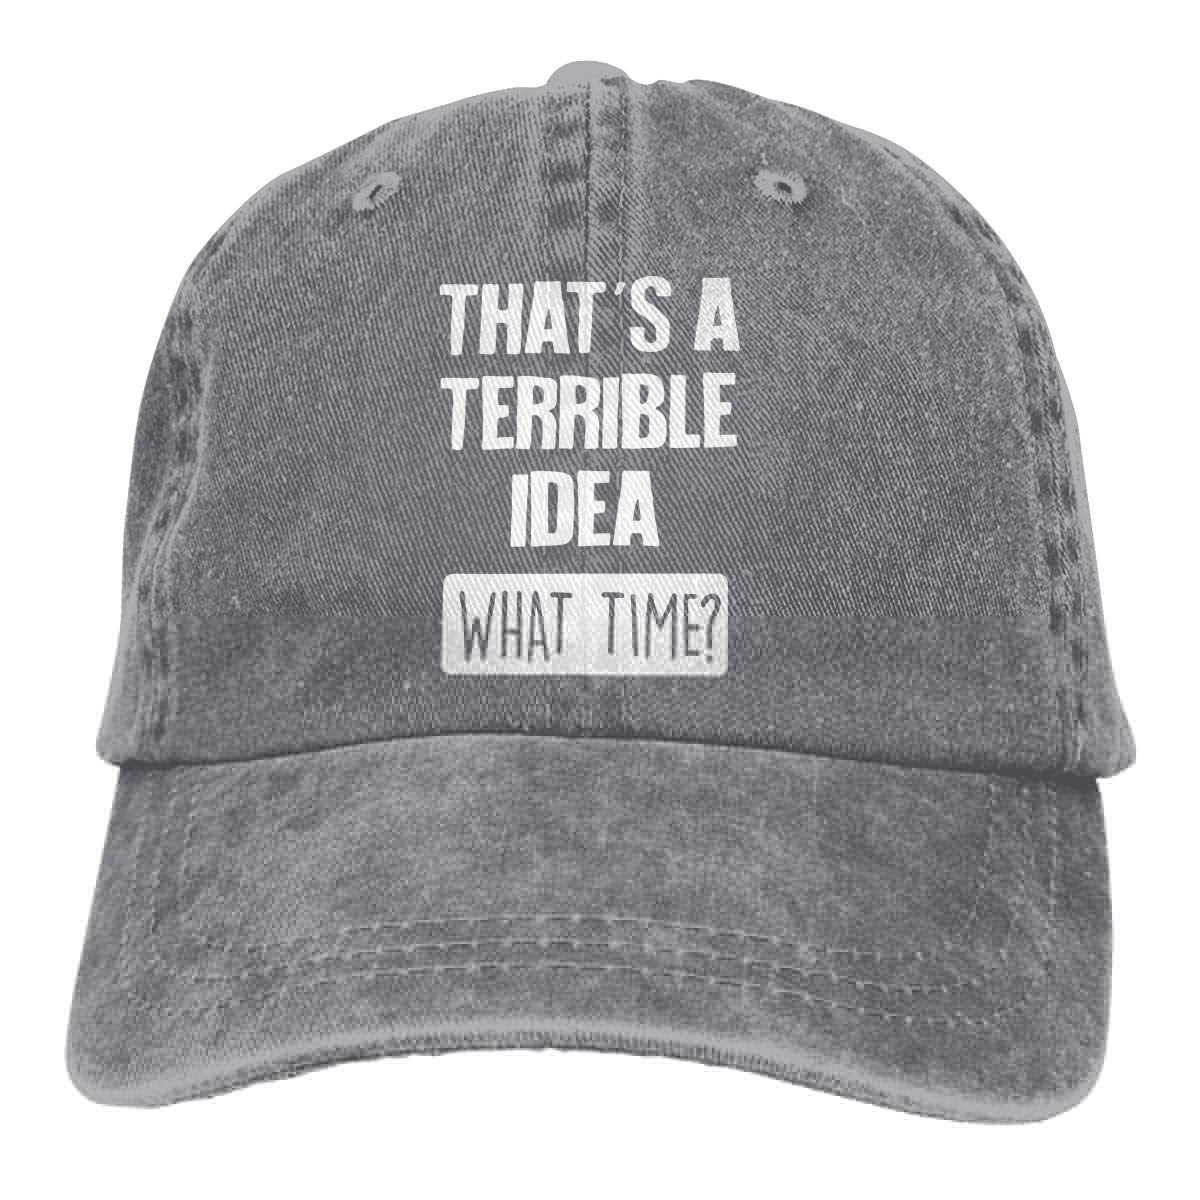 Thats A Terrible Idea What Time Men/&Women Adjustable Baseball Caps Yarn-Dyed Denim Trucker Cap